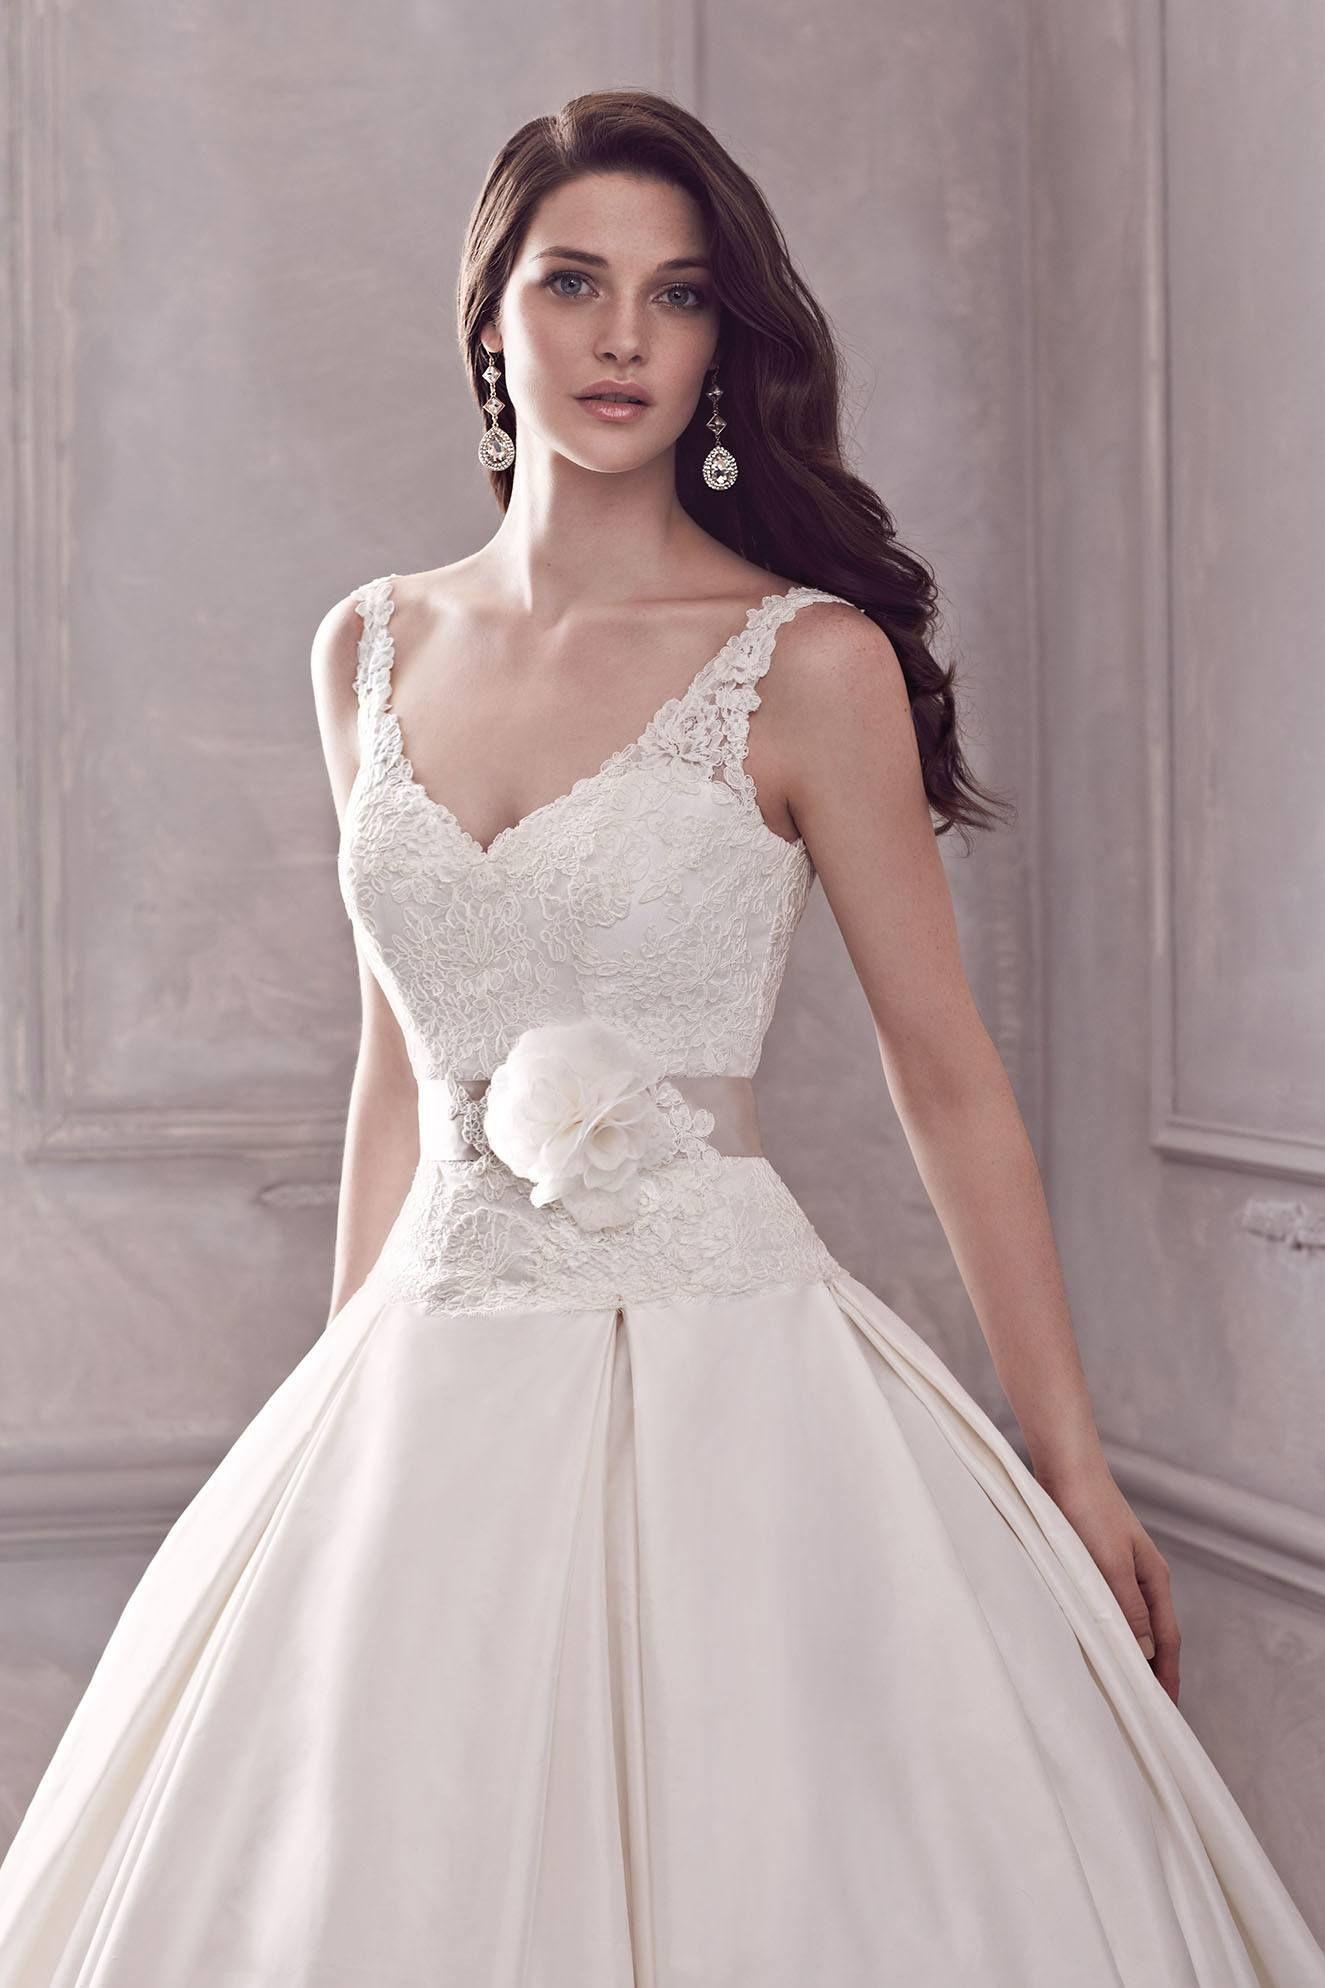 Ball Gown Wedding Dress - Style #4400 | Paloma blanca, Wedding ...